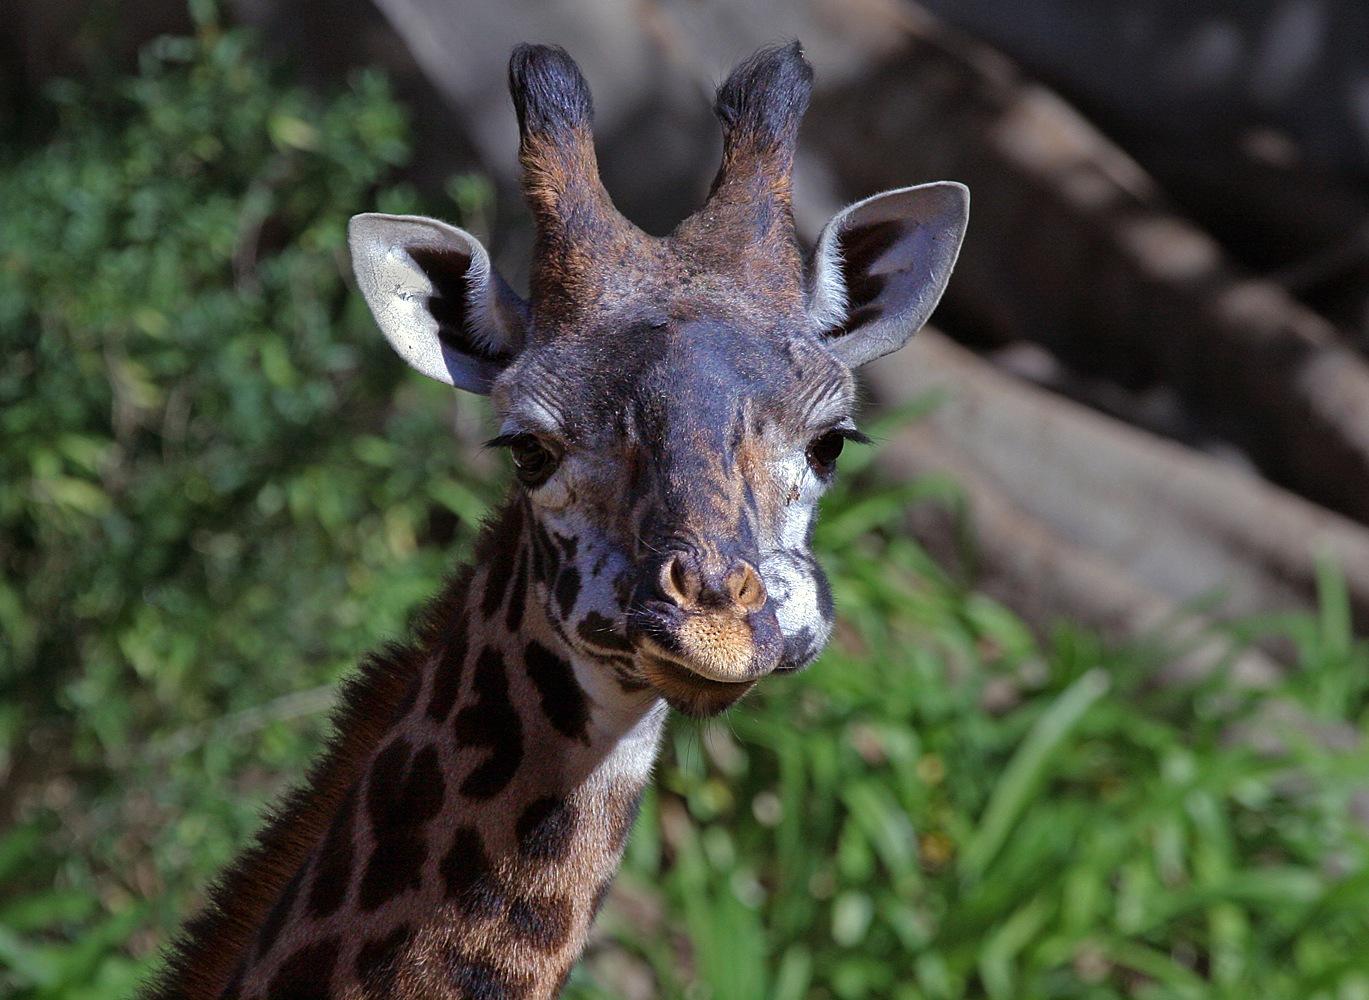 Giraffe by Carl Main